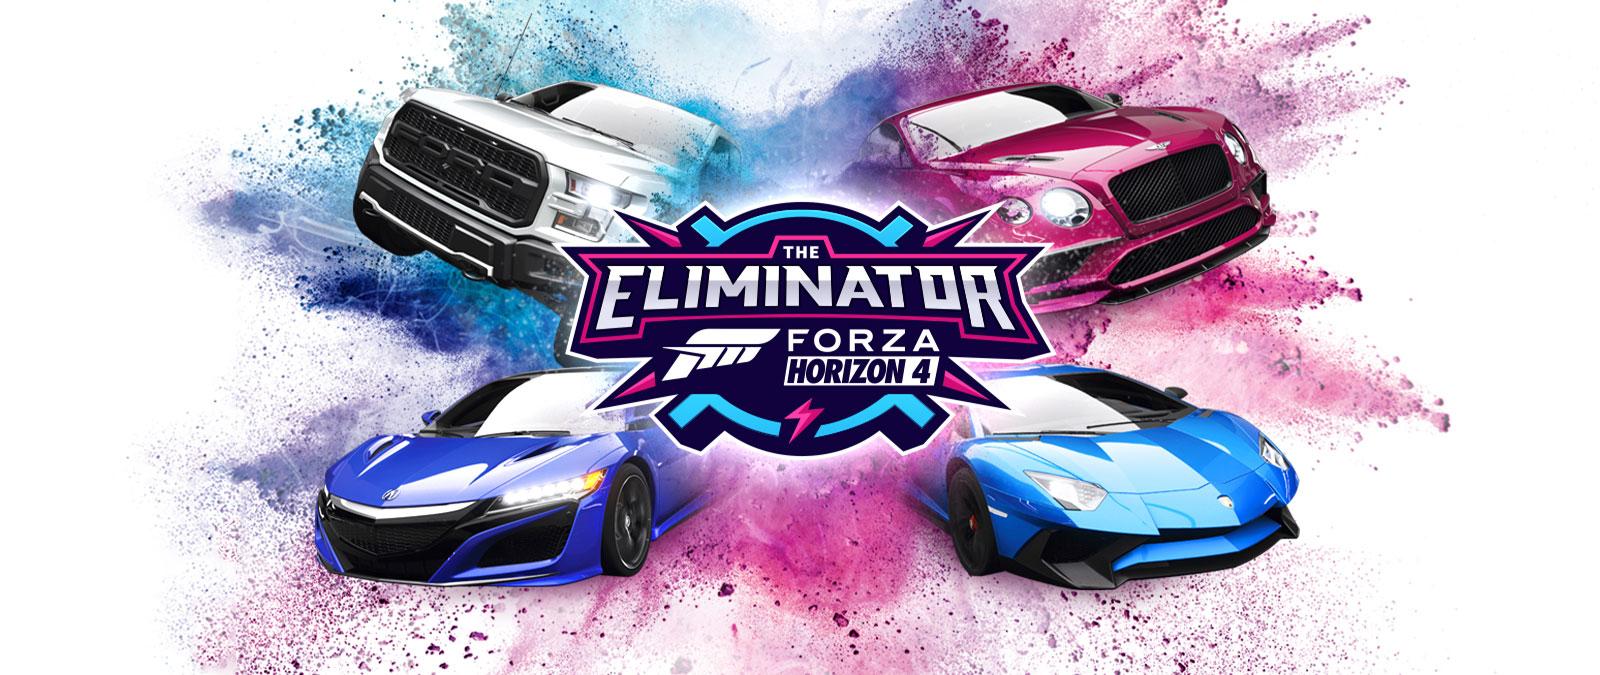 The Eliminator, λογότυπο του Forza Horizon 4, τέσσερα αυτοκίνητα με μπλε και ροζ σκόνη γύρω τους